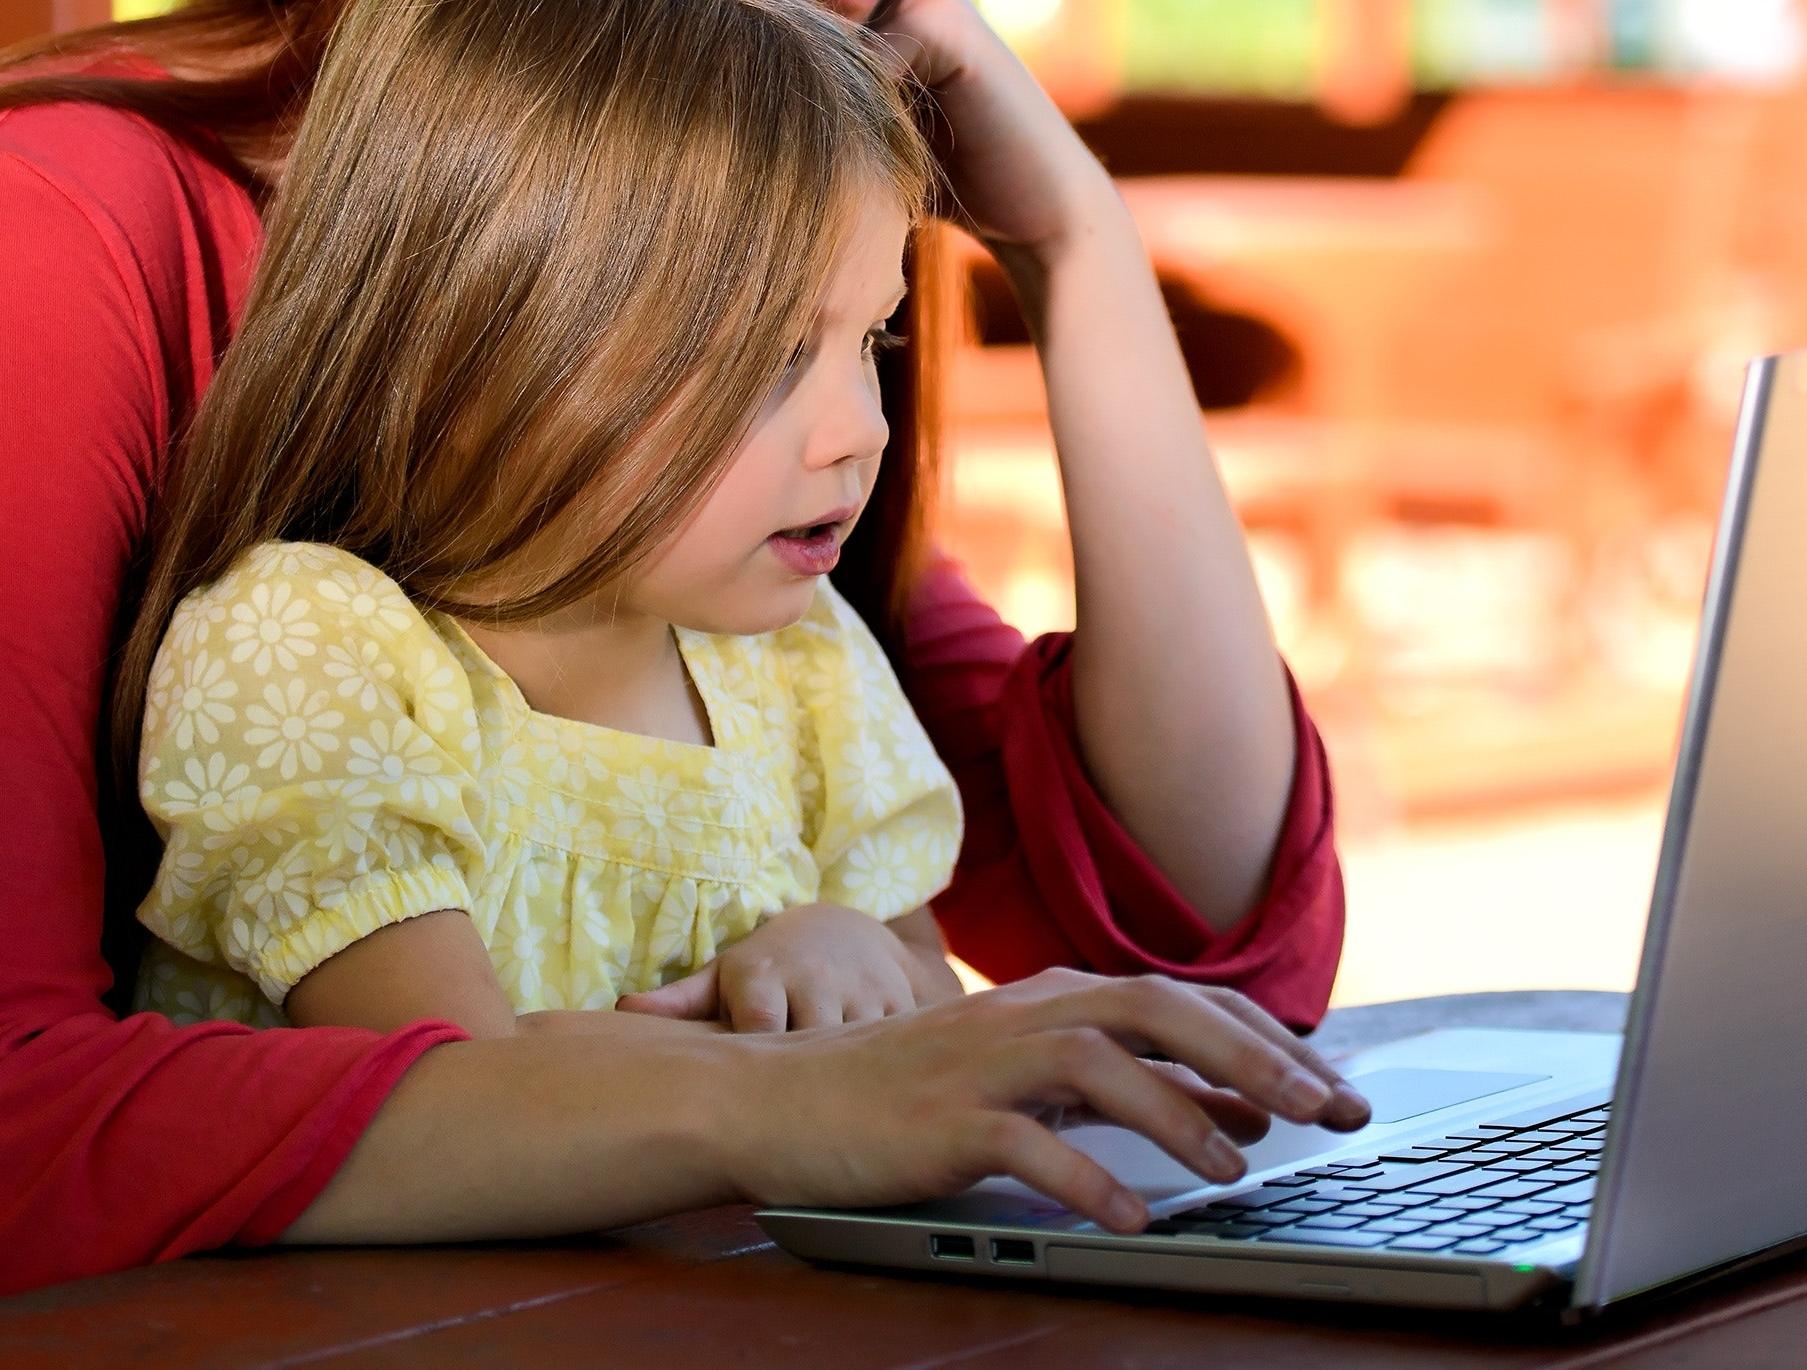 child-computer-cute-159848 Pexels.jpg